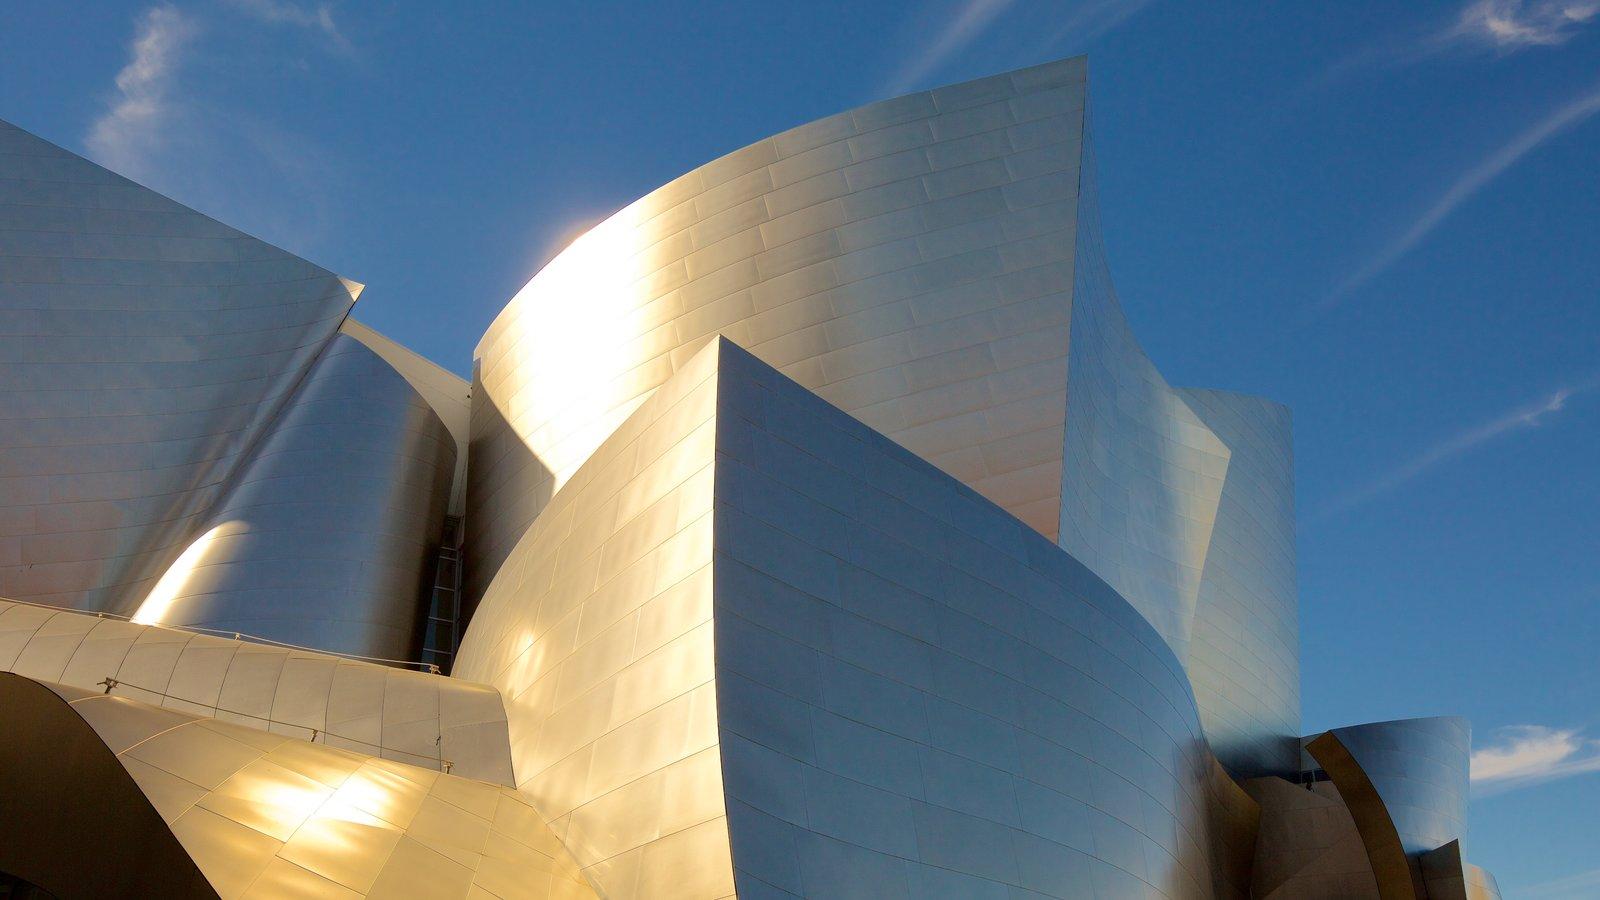 Sala de conciertos Walt Disney Concert Hall que incluye arquitectura moderna